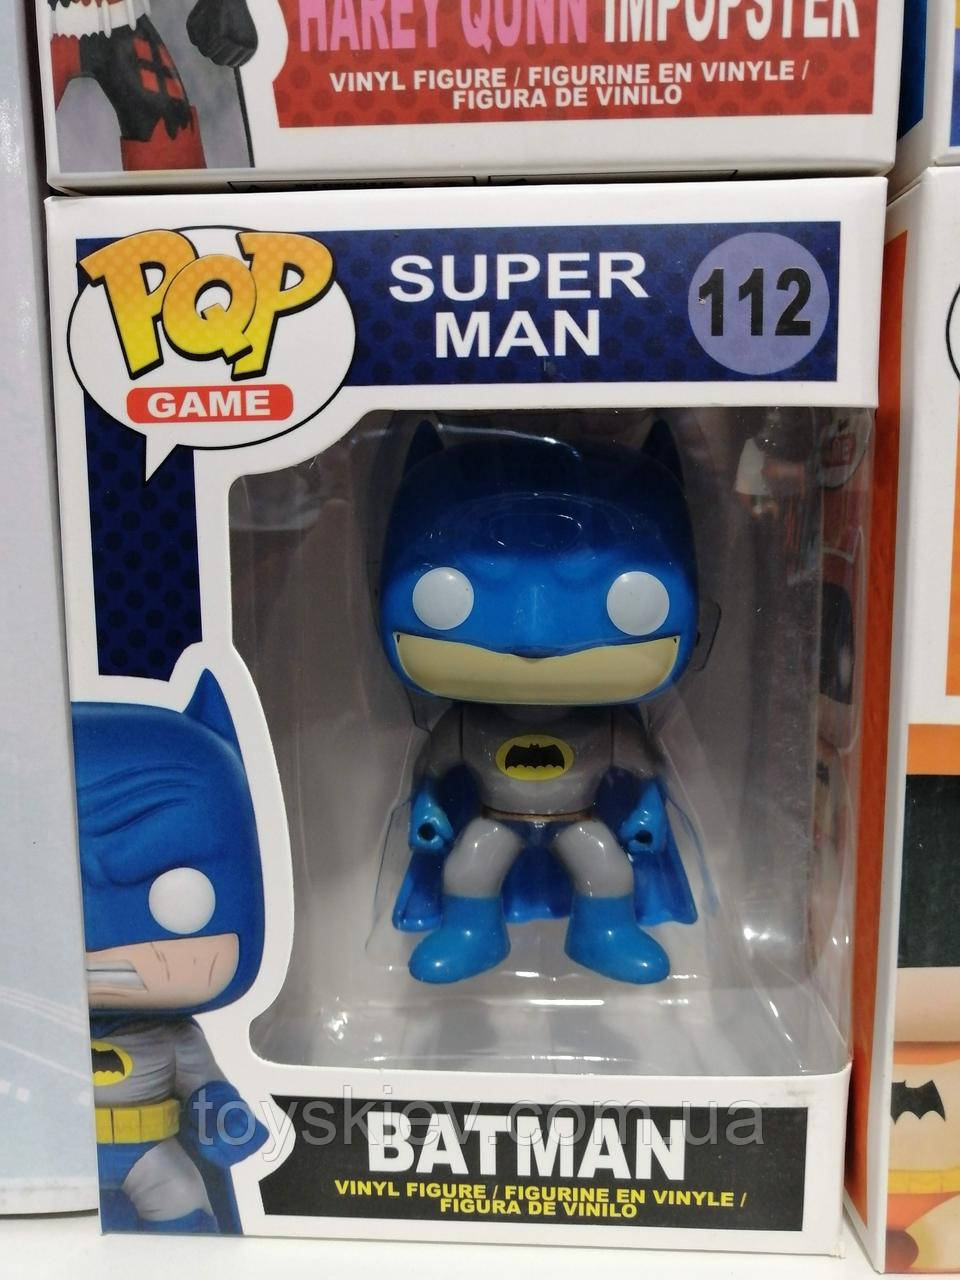 Фигурка Funko Pop Фанко Поп из серии Супер мен, Super Man, Бетмен, Batman (аналог)